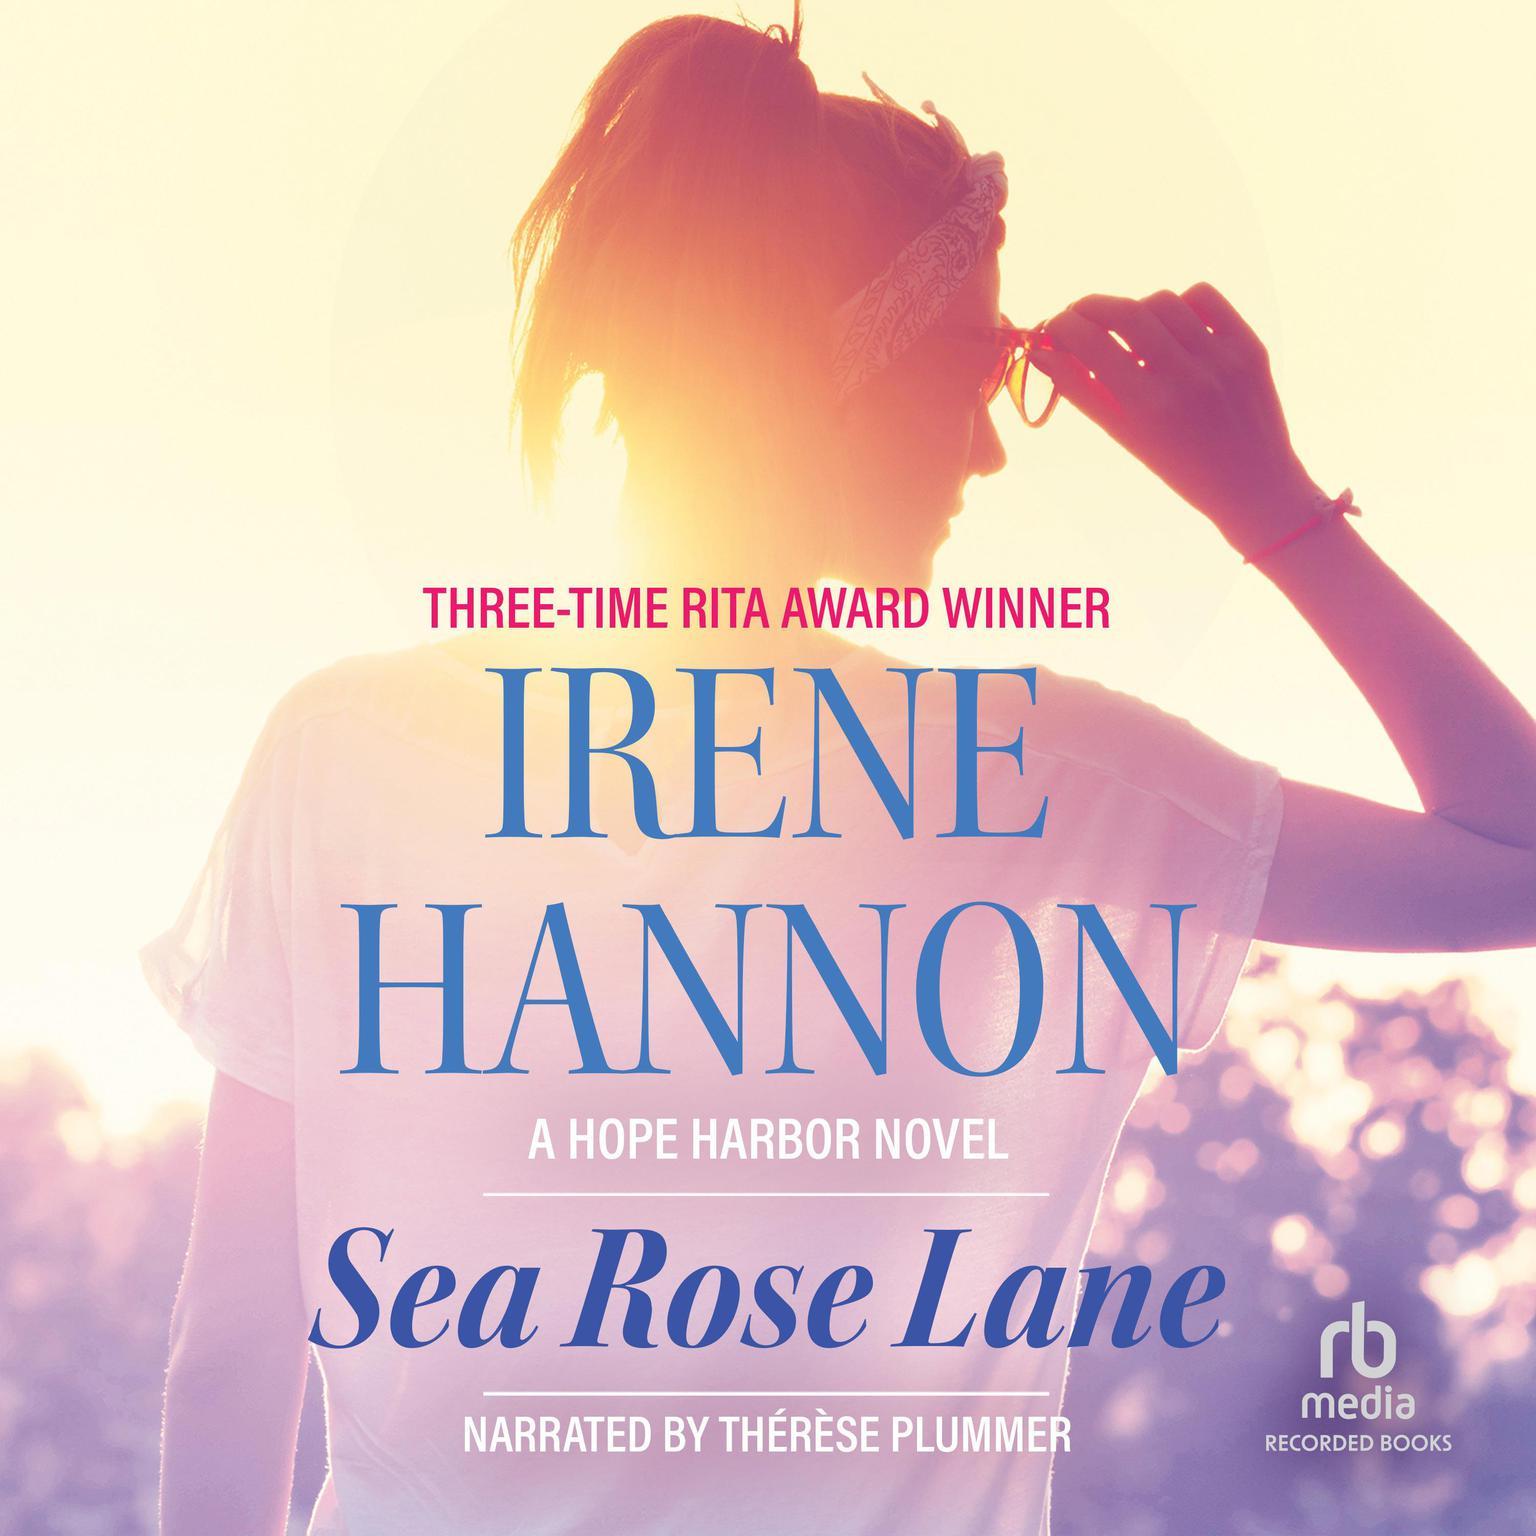 Sea Rose Lane Audiobook, by Irene Hannon